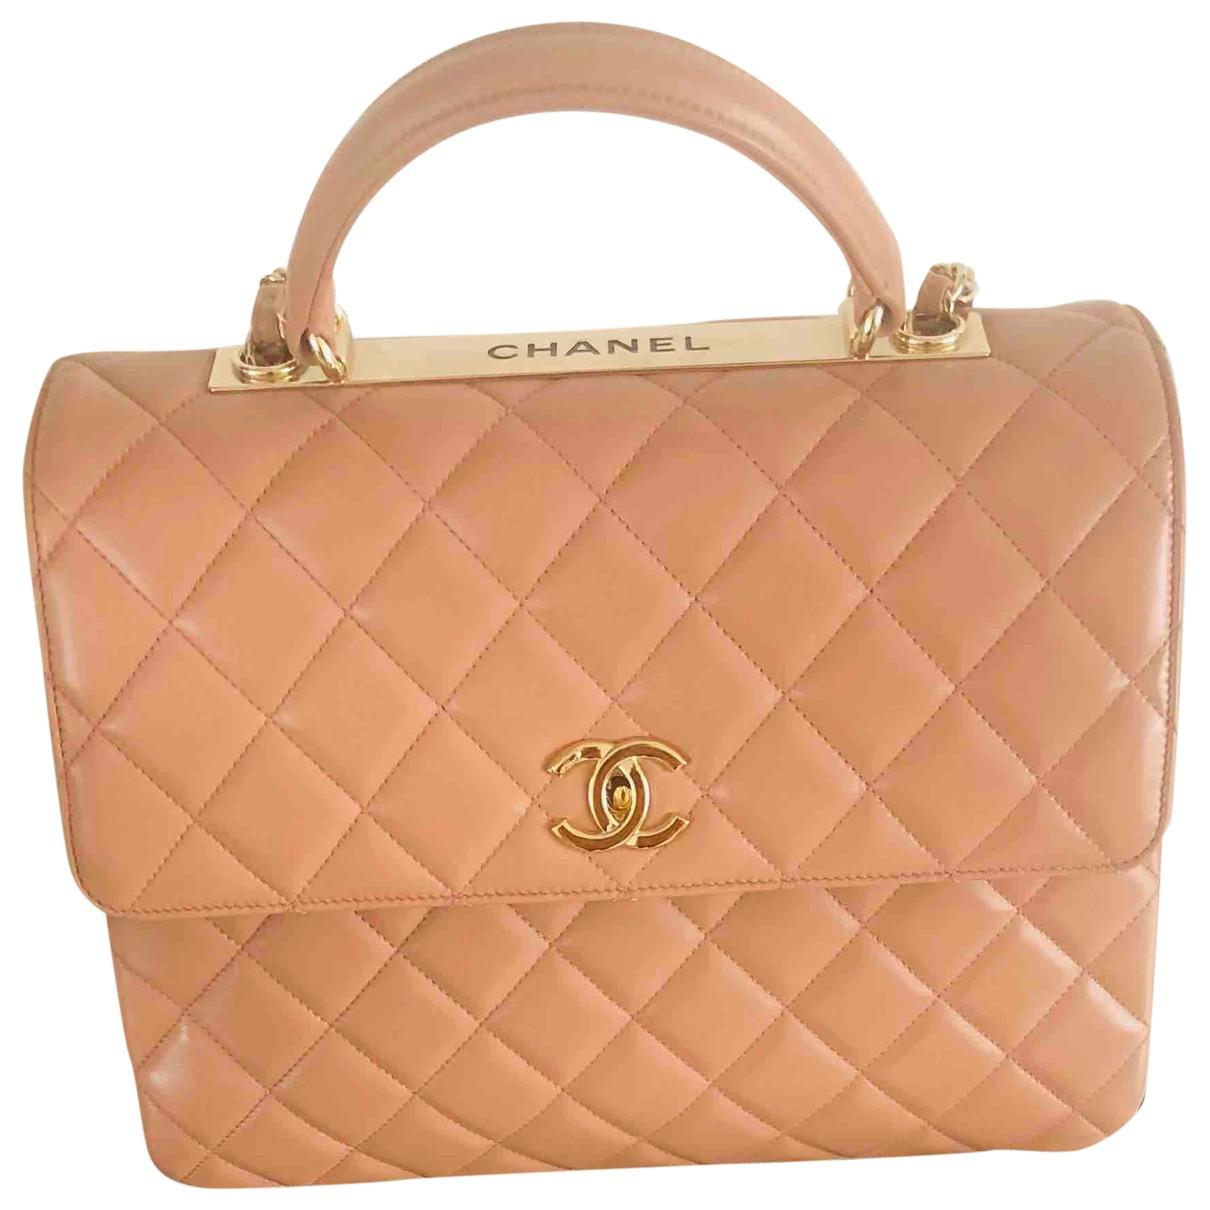 Chanel Trendy CC Handtasche in  Beige Leder